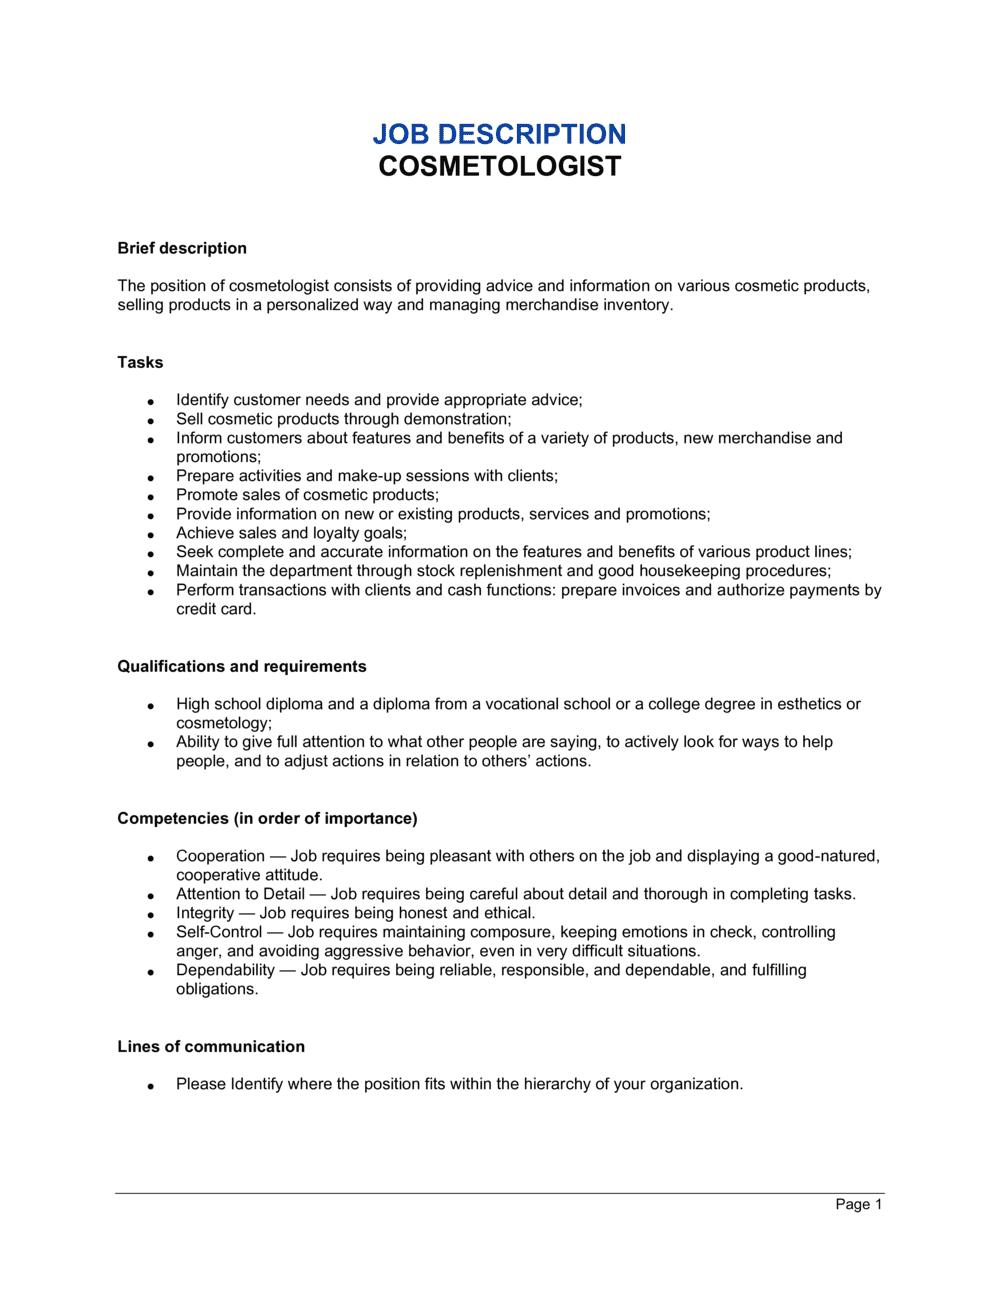 Business-in-a-Box's Cosmetologist Job Description Template